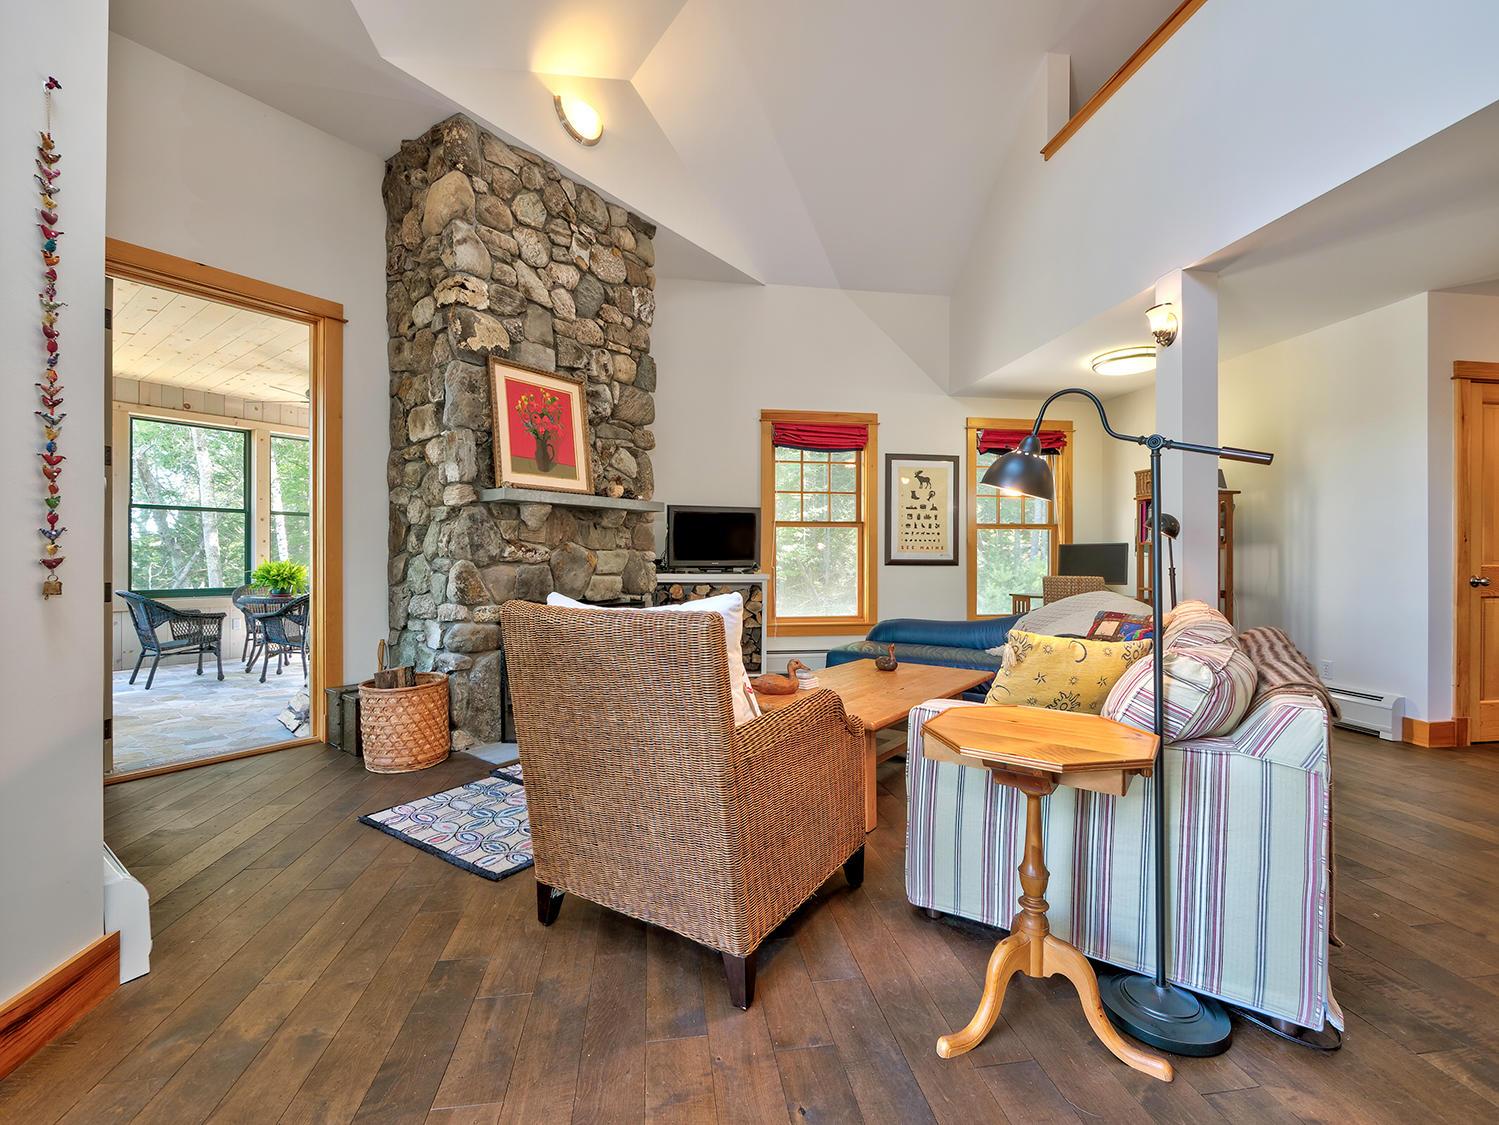 9-Liv Room 41 Northwest Cove HiRes (36)